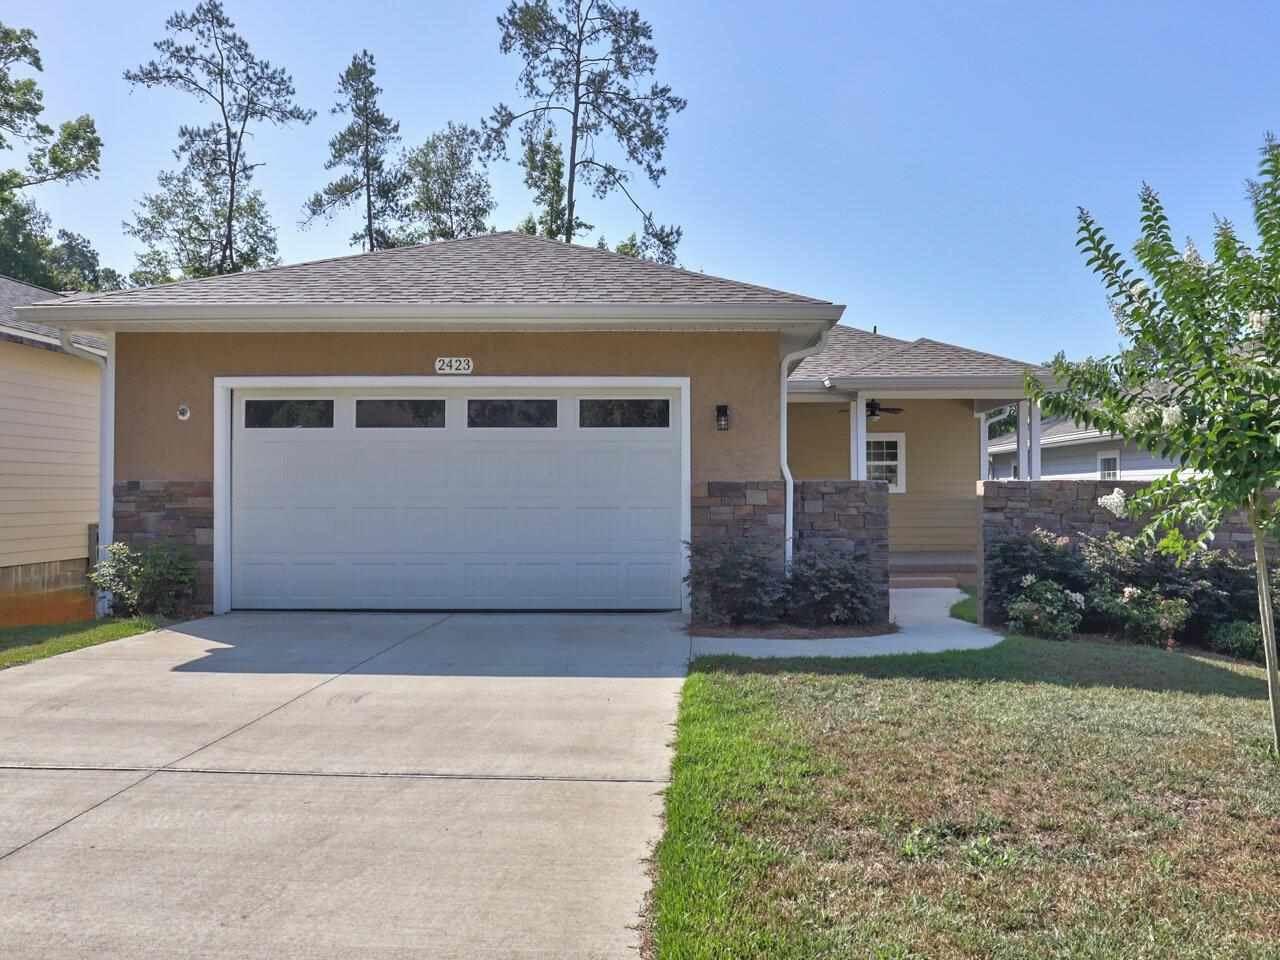 2423 Tippecanoe Ridge, Tallahassee, FL 32303 - MLS#: 333216